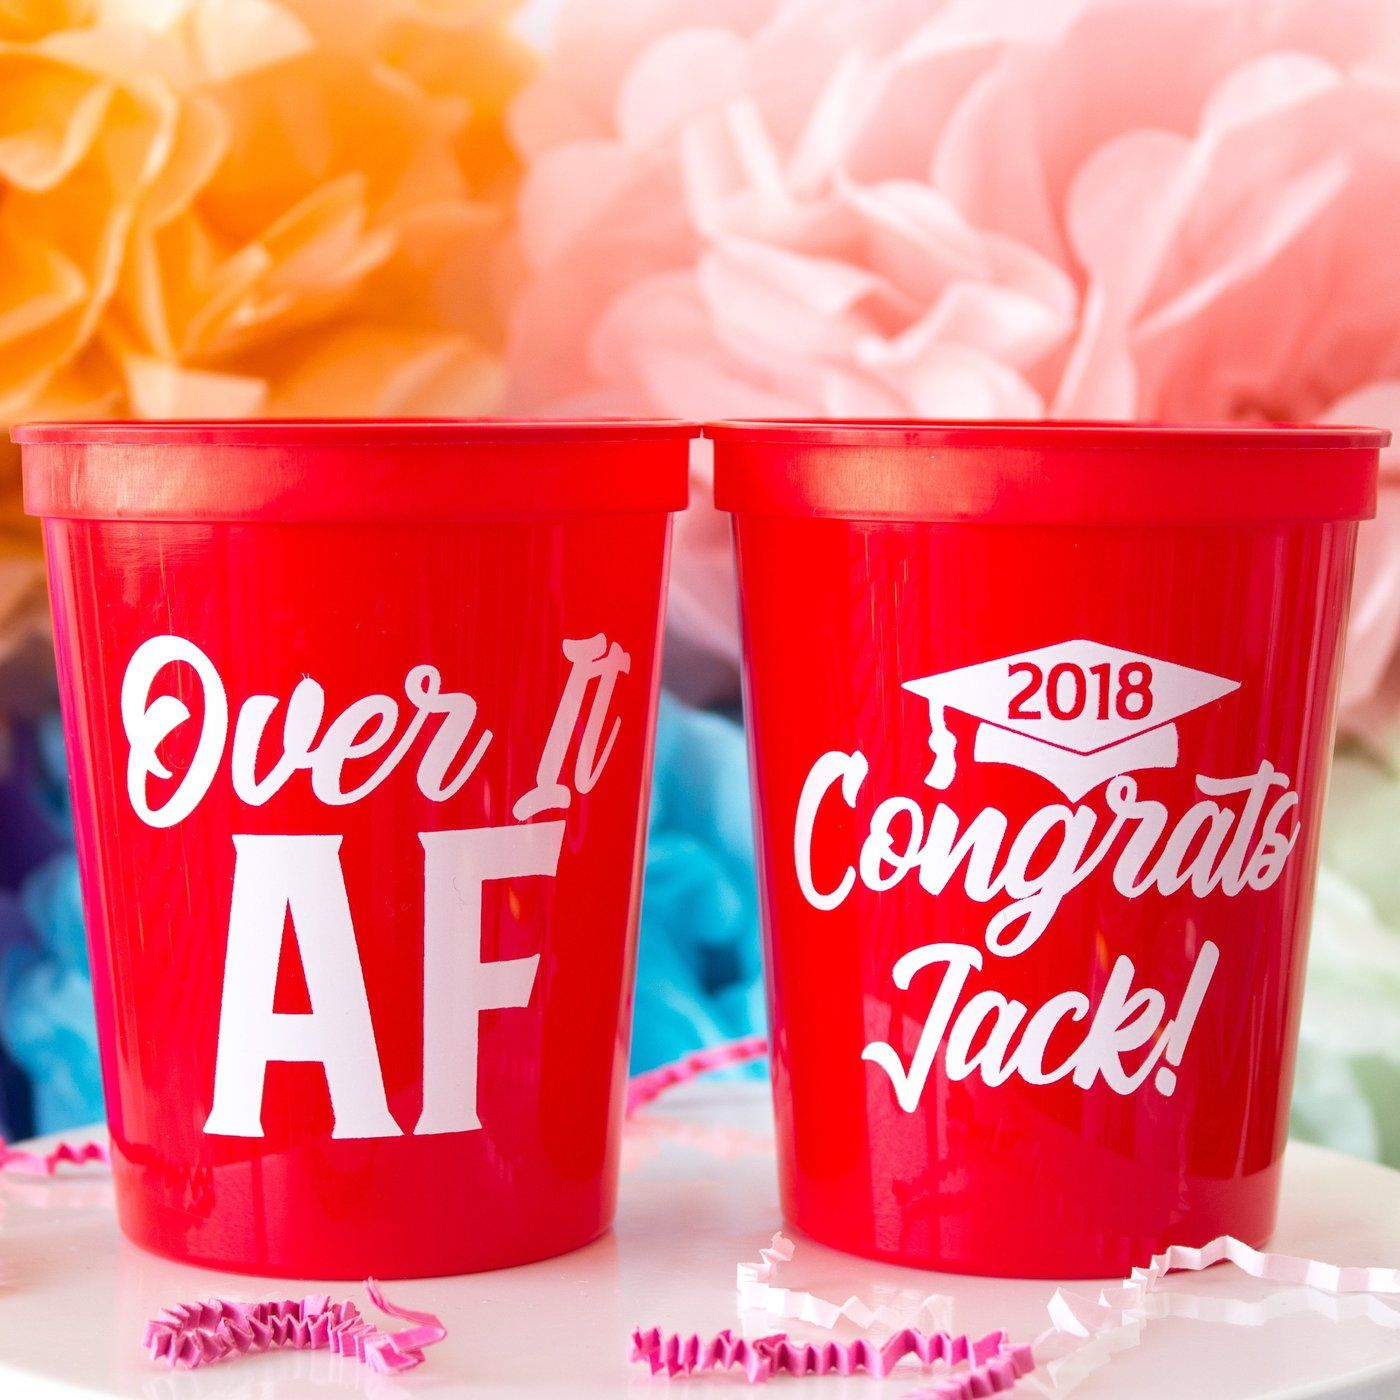 Graduation Party Decor Stadium Cups Custom Designed And Printed Personalized 16 Oz Plastic Stadium Graduation Party Cup Party Cups Graduation Party Decor